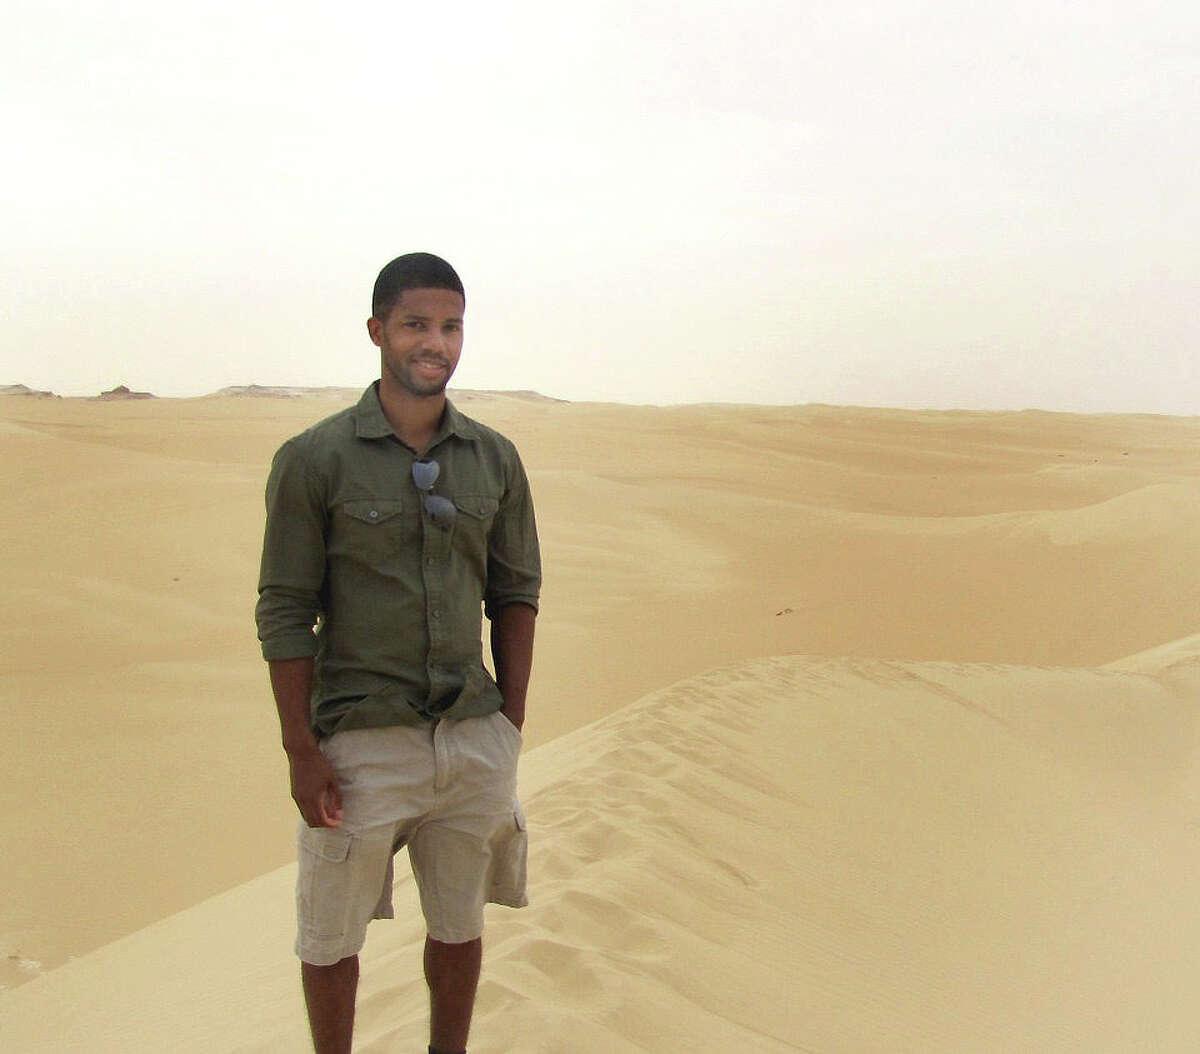 Marcus Walton in the Sahara Dessert.